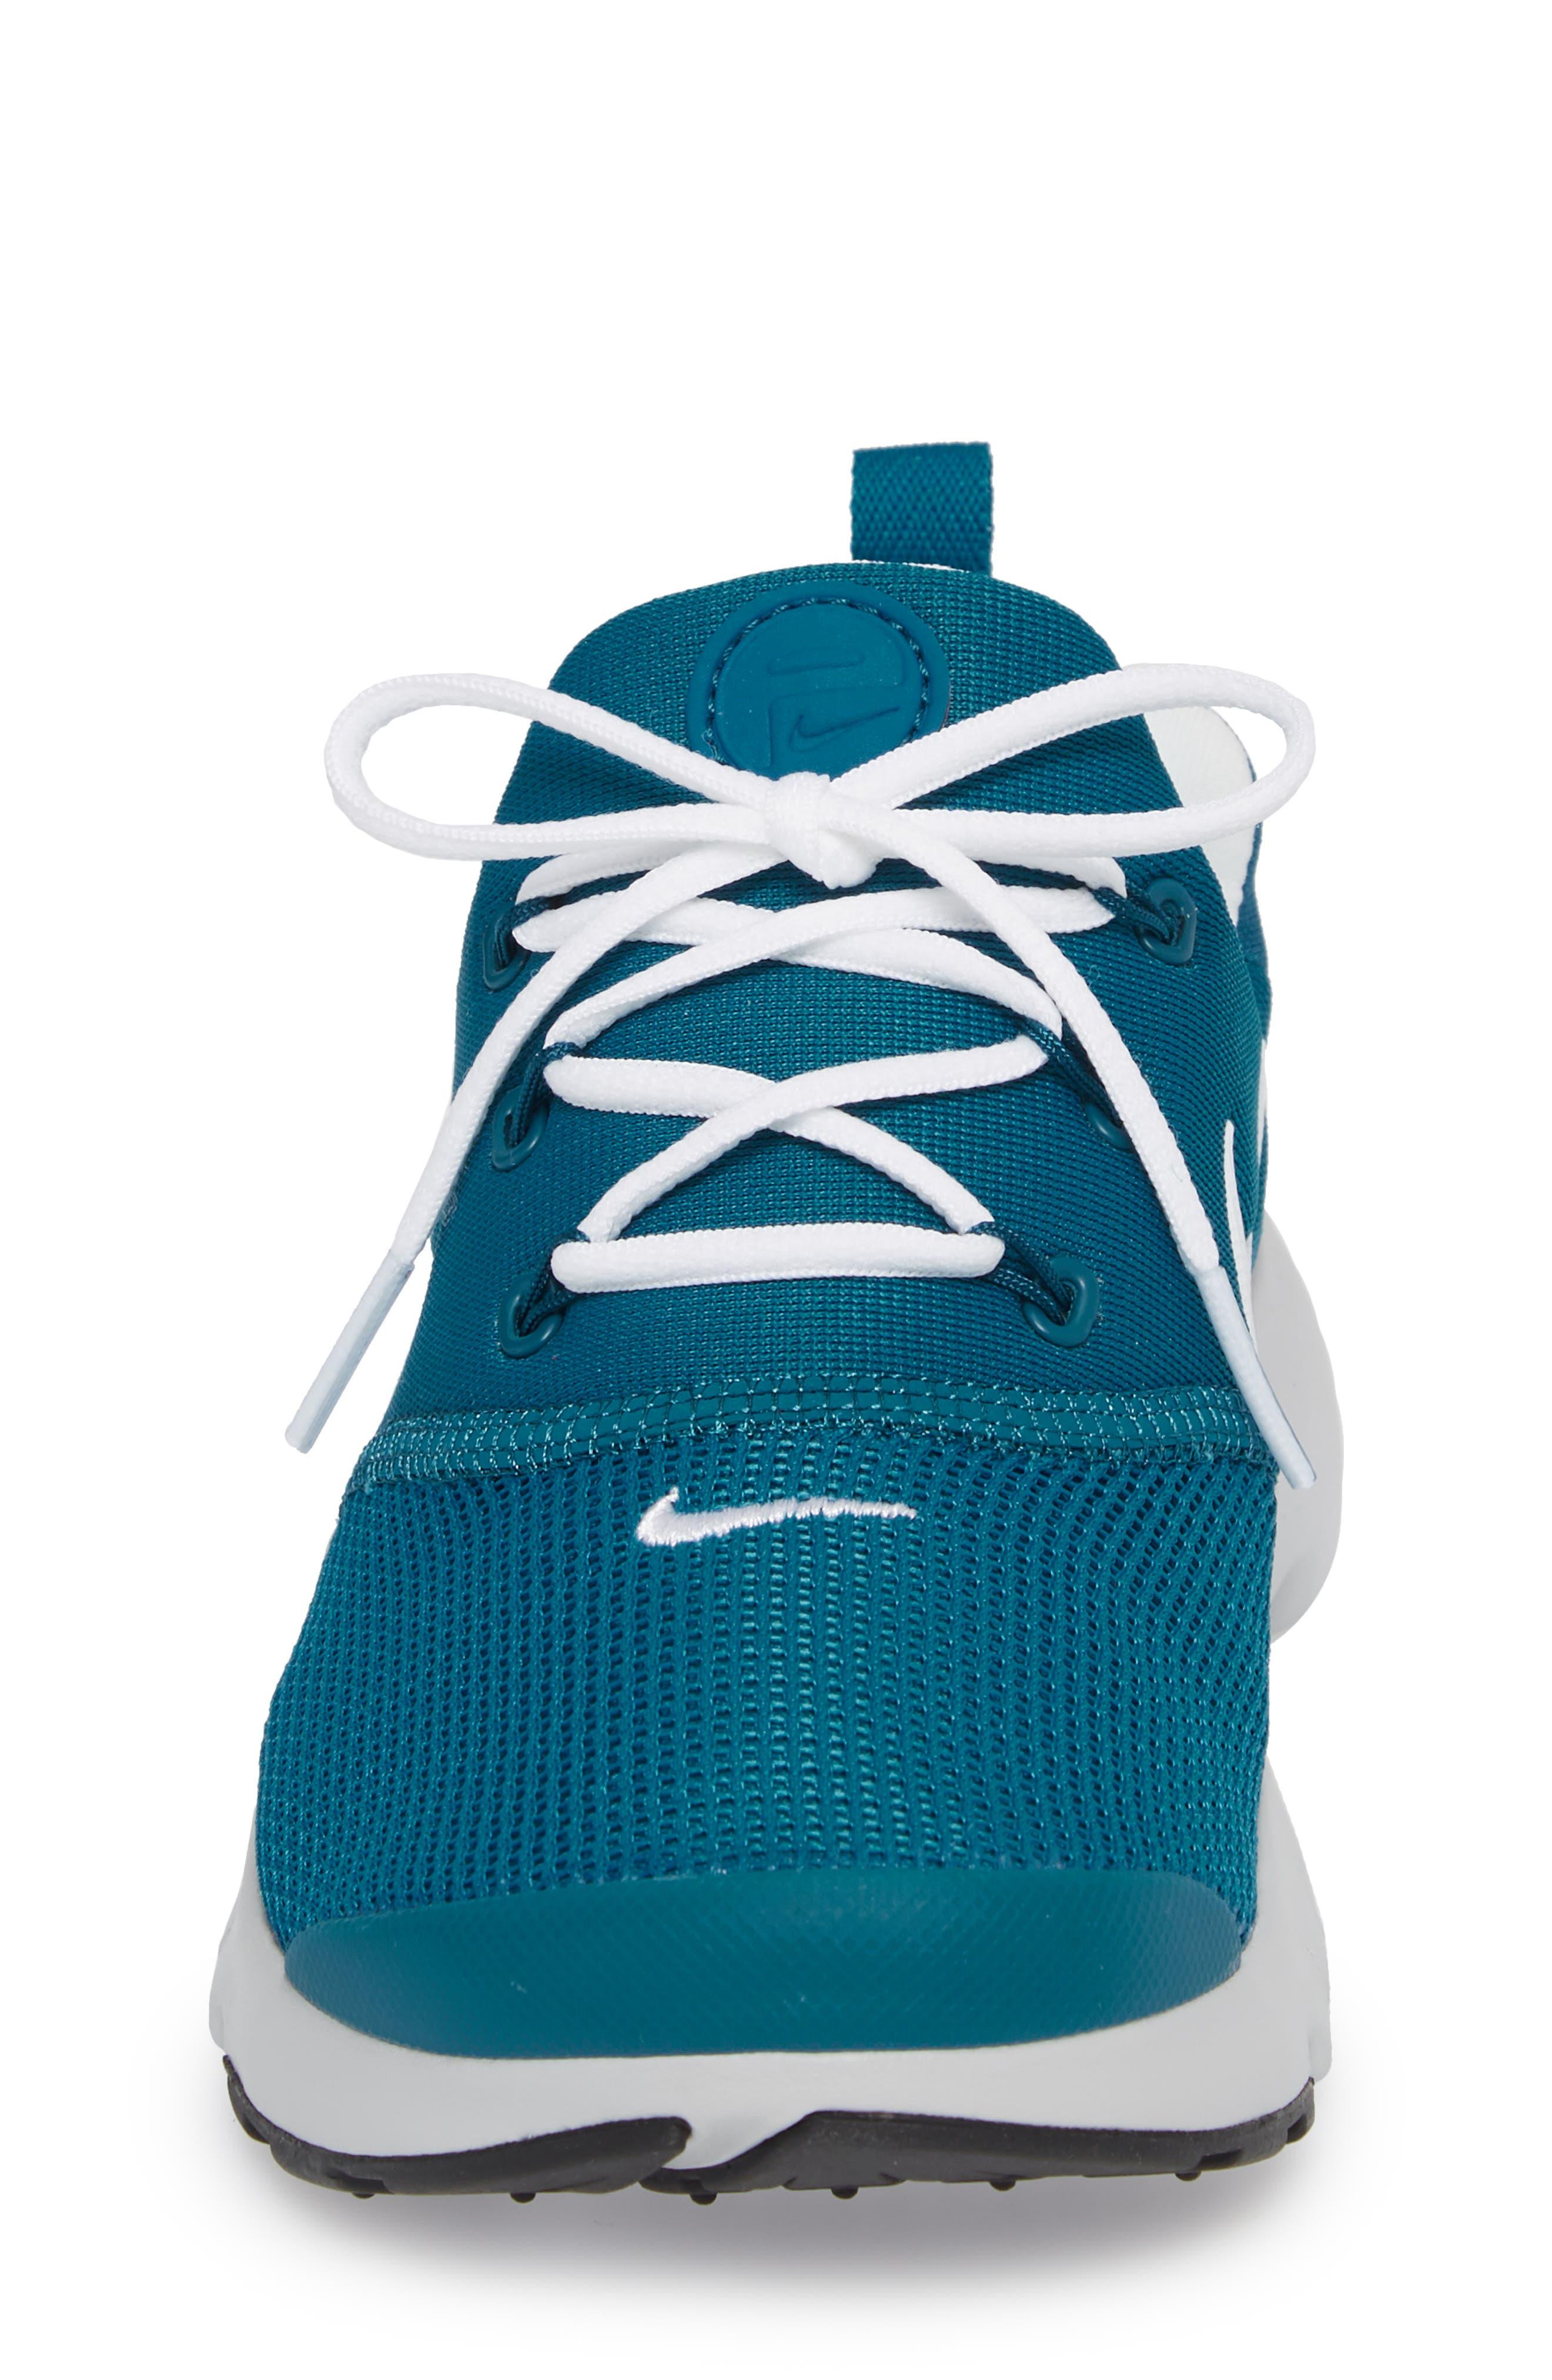 Presto Fly Sneaker,                             Alternate thumbnail 4, color,                             440